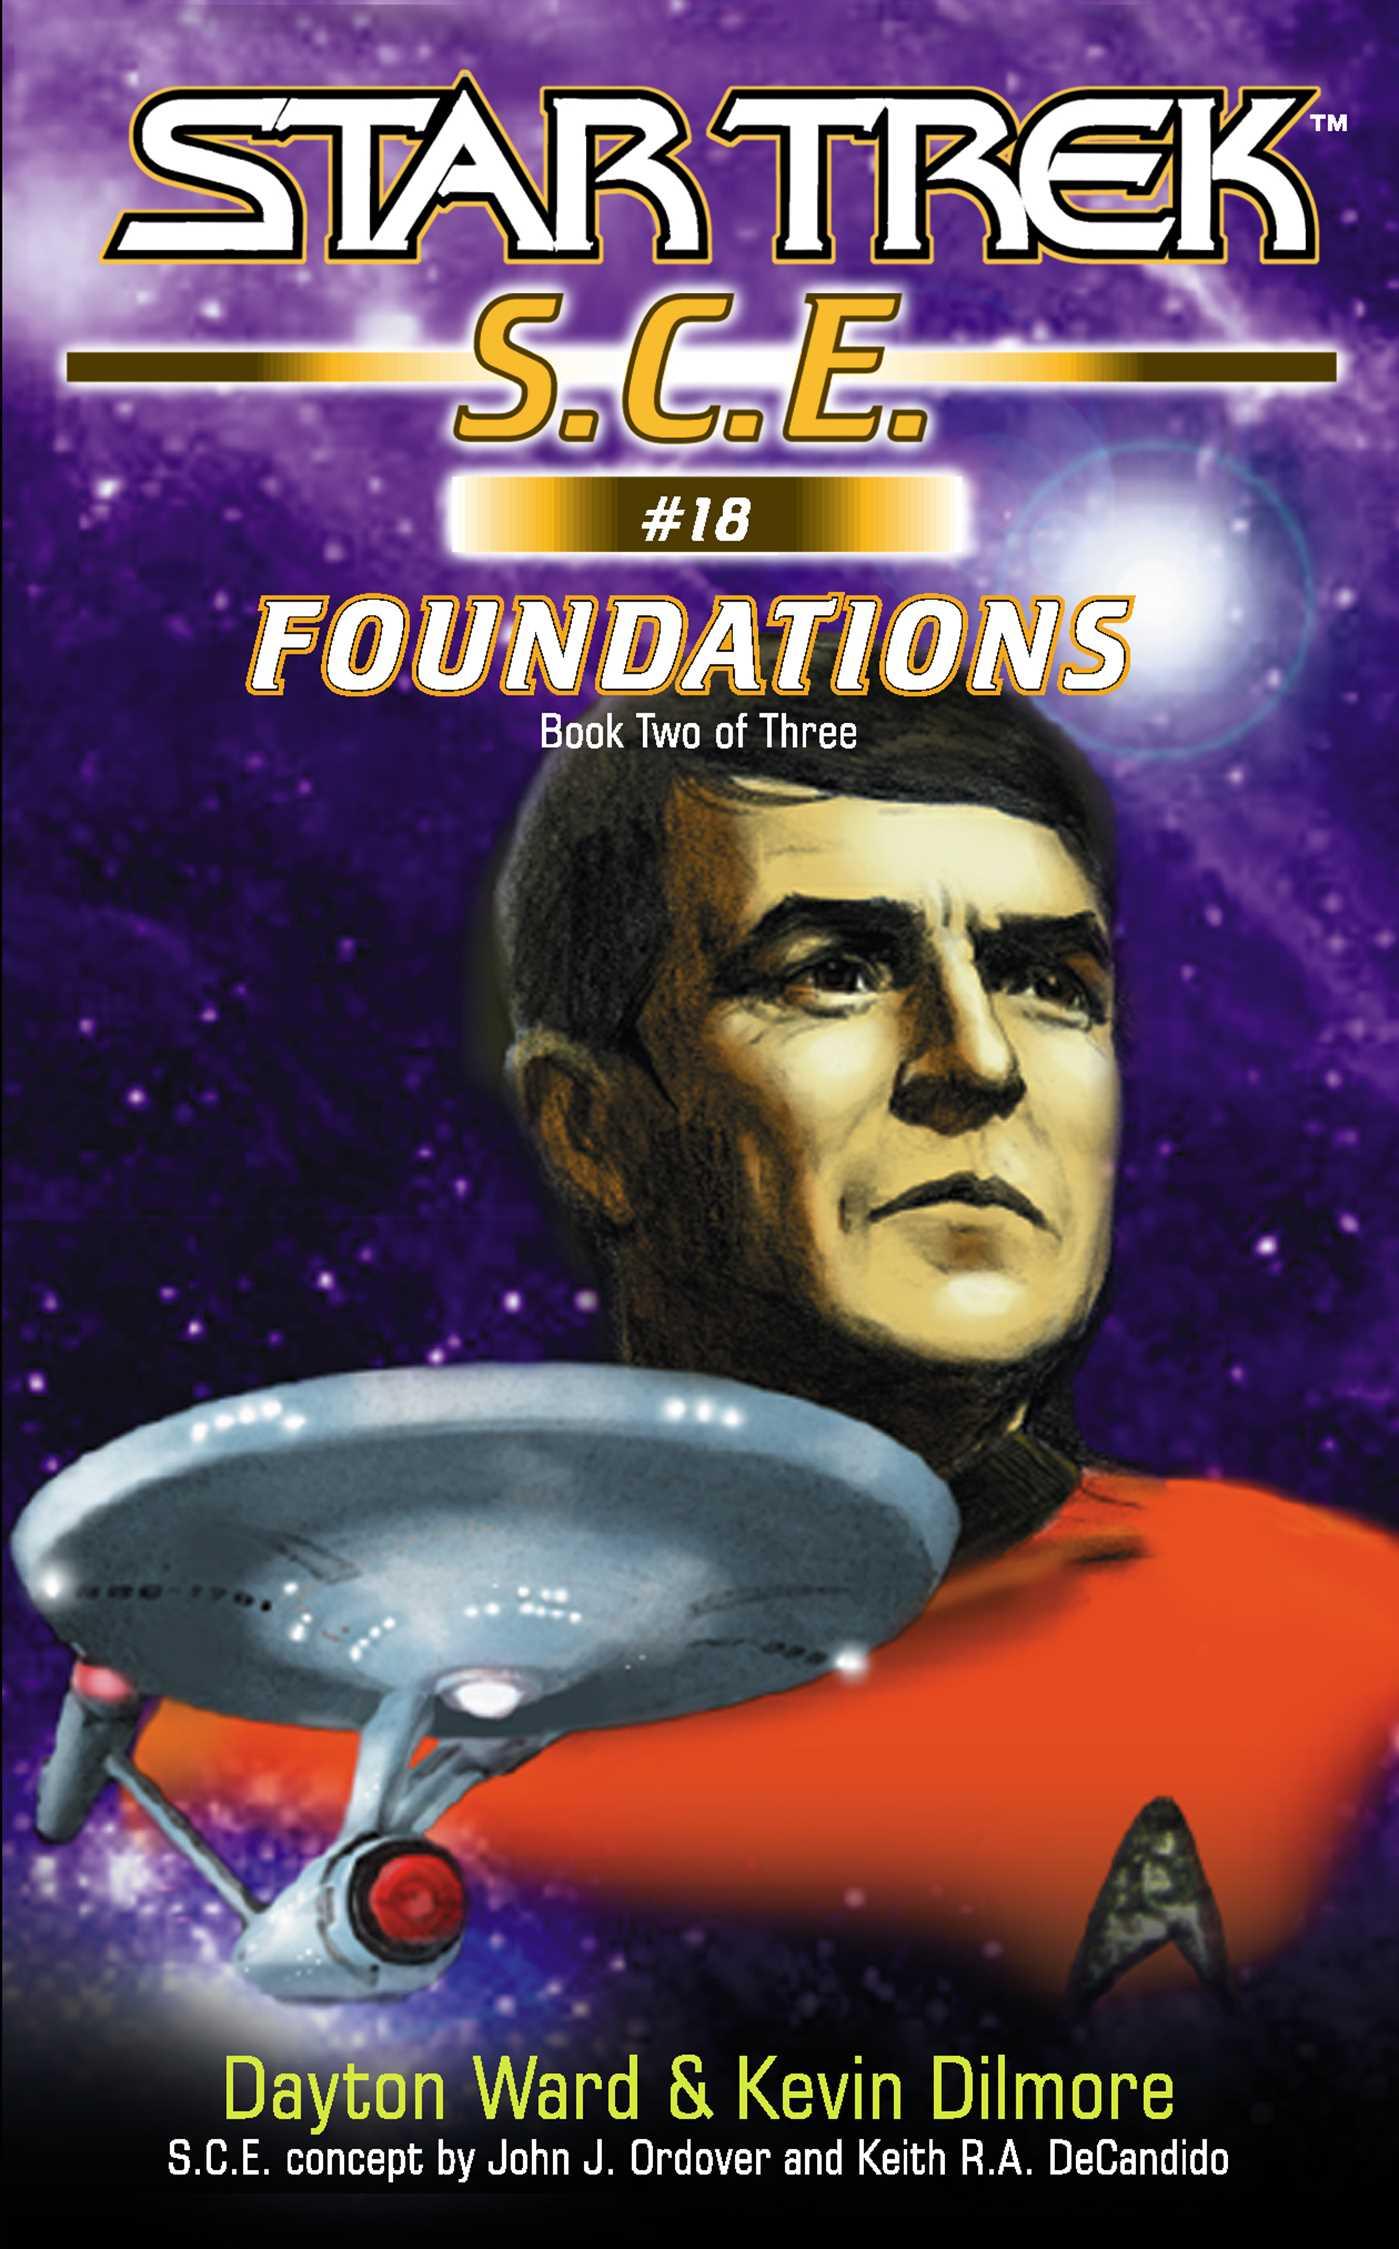 Star trek corps of engineers foundations 2 9780743456739 hr